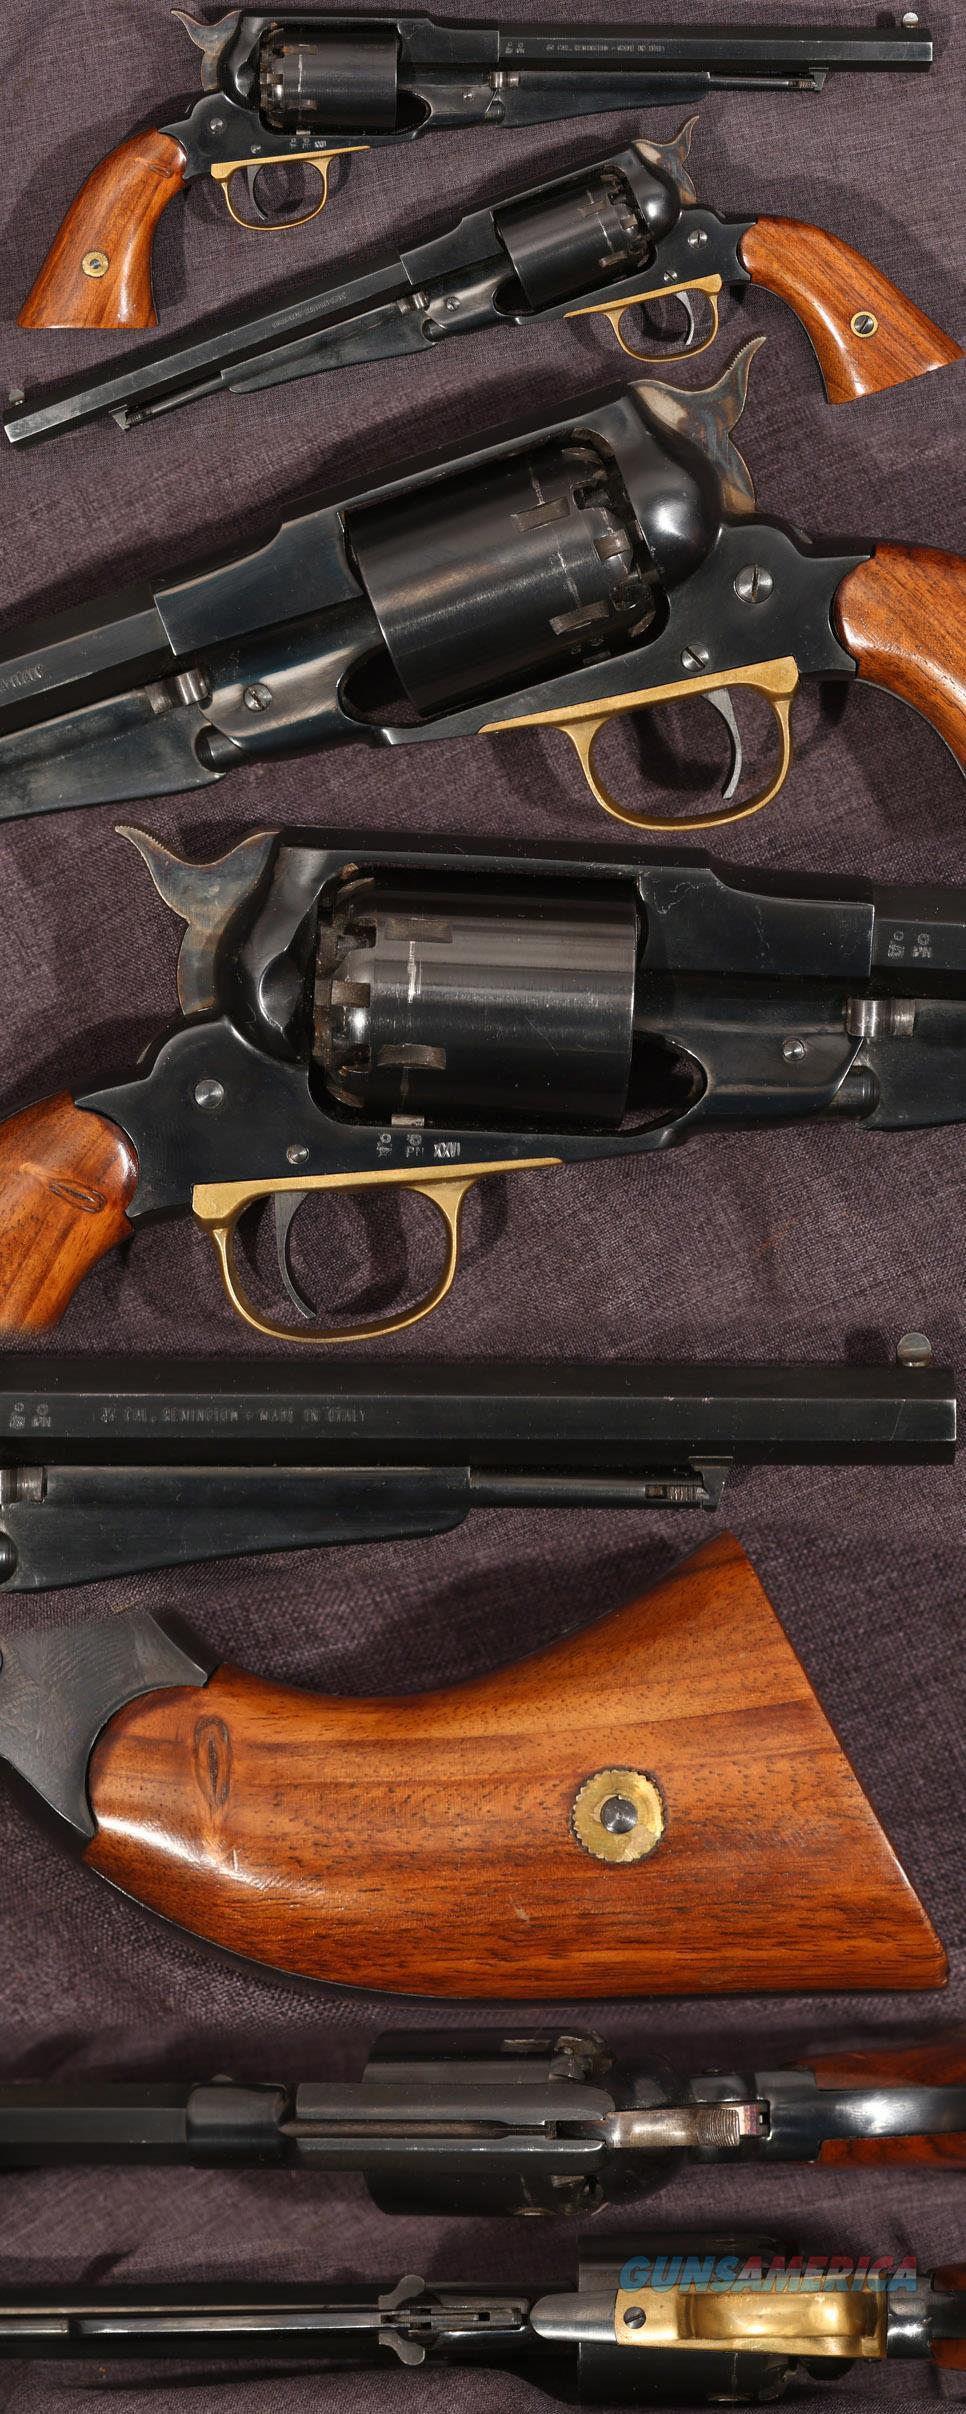 Euroarms Remington New Model Army revolver  Guns > Pistols > Remington Replica Pistols